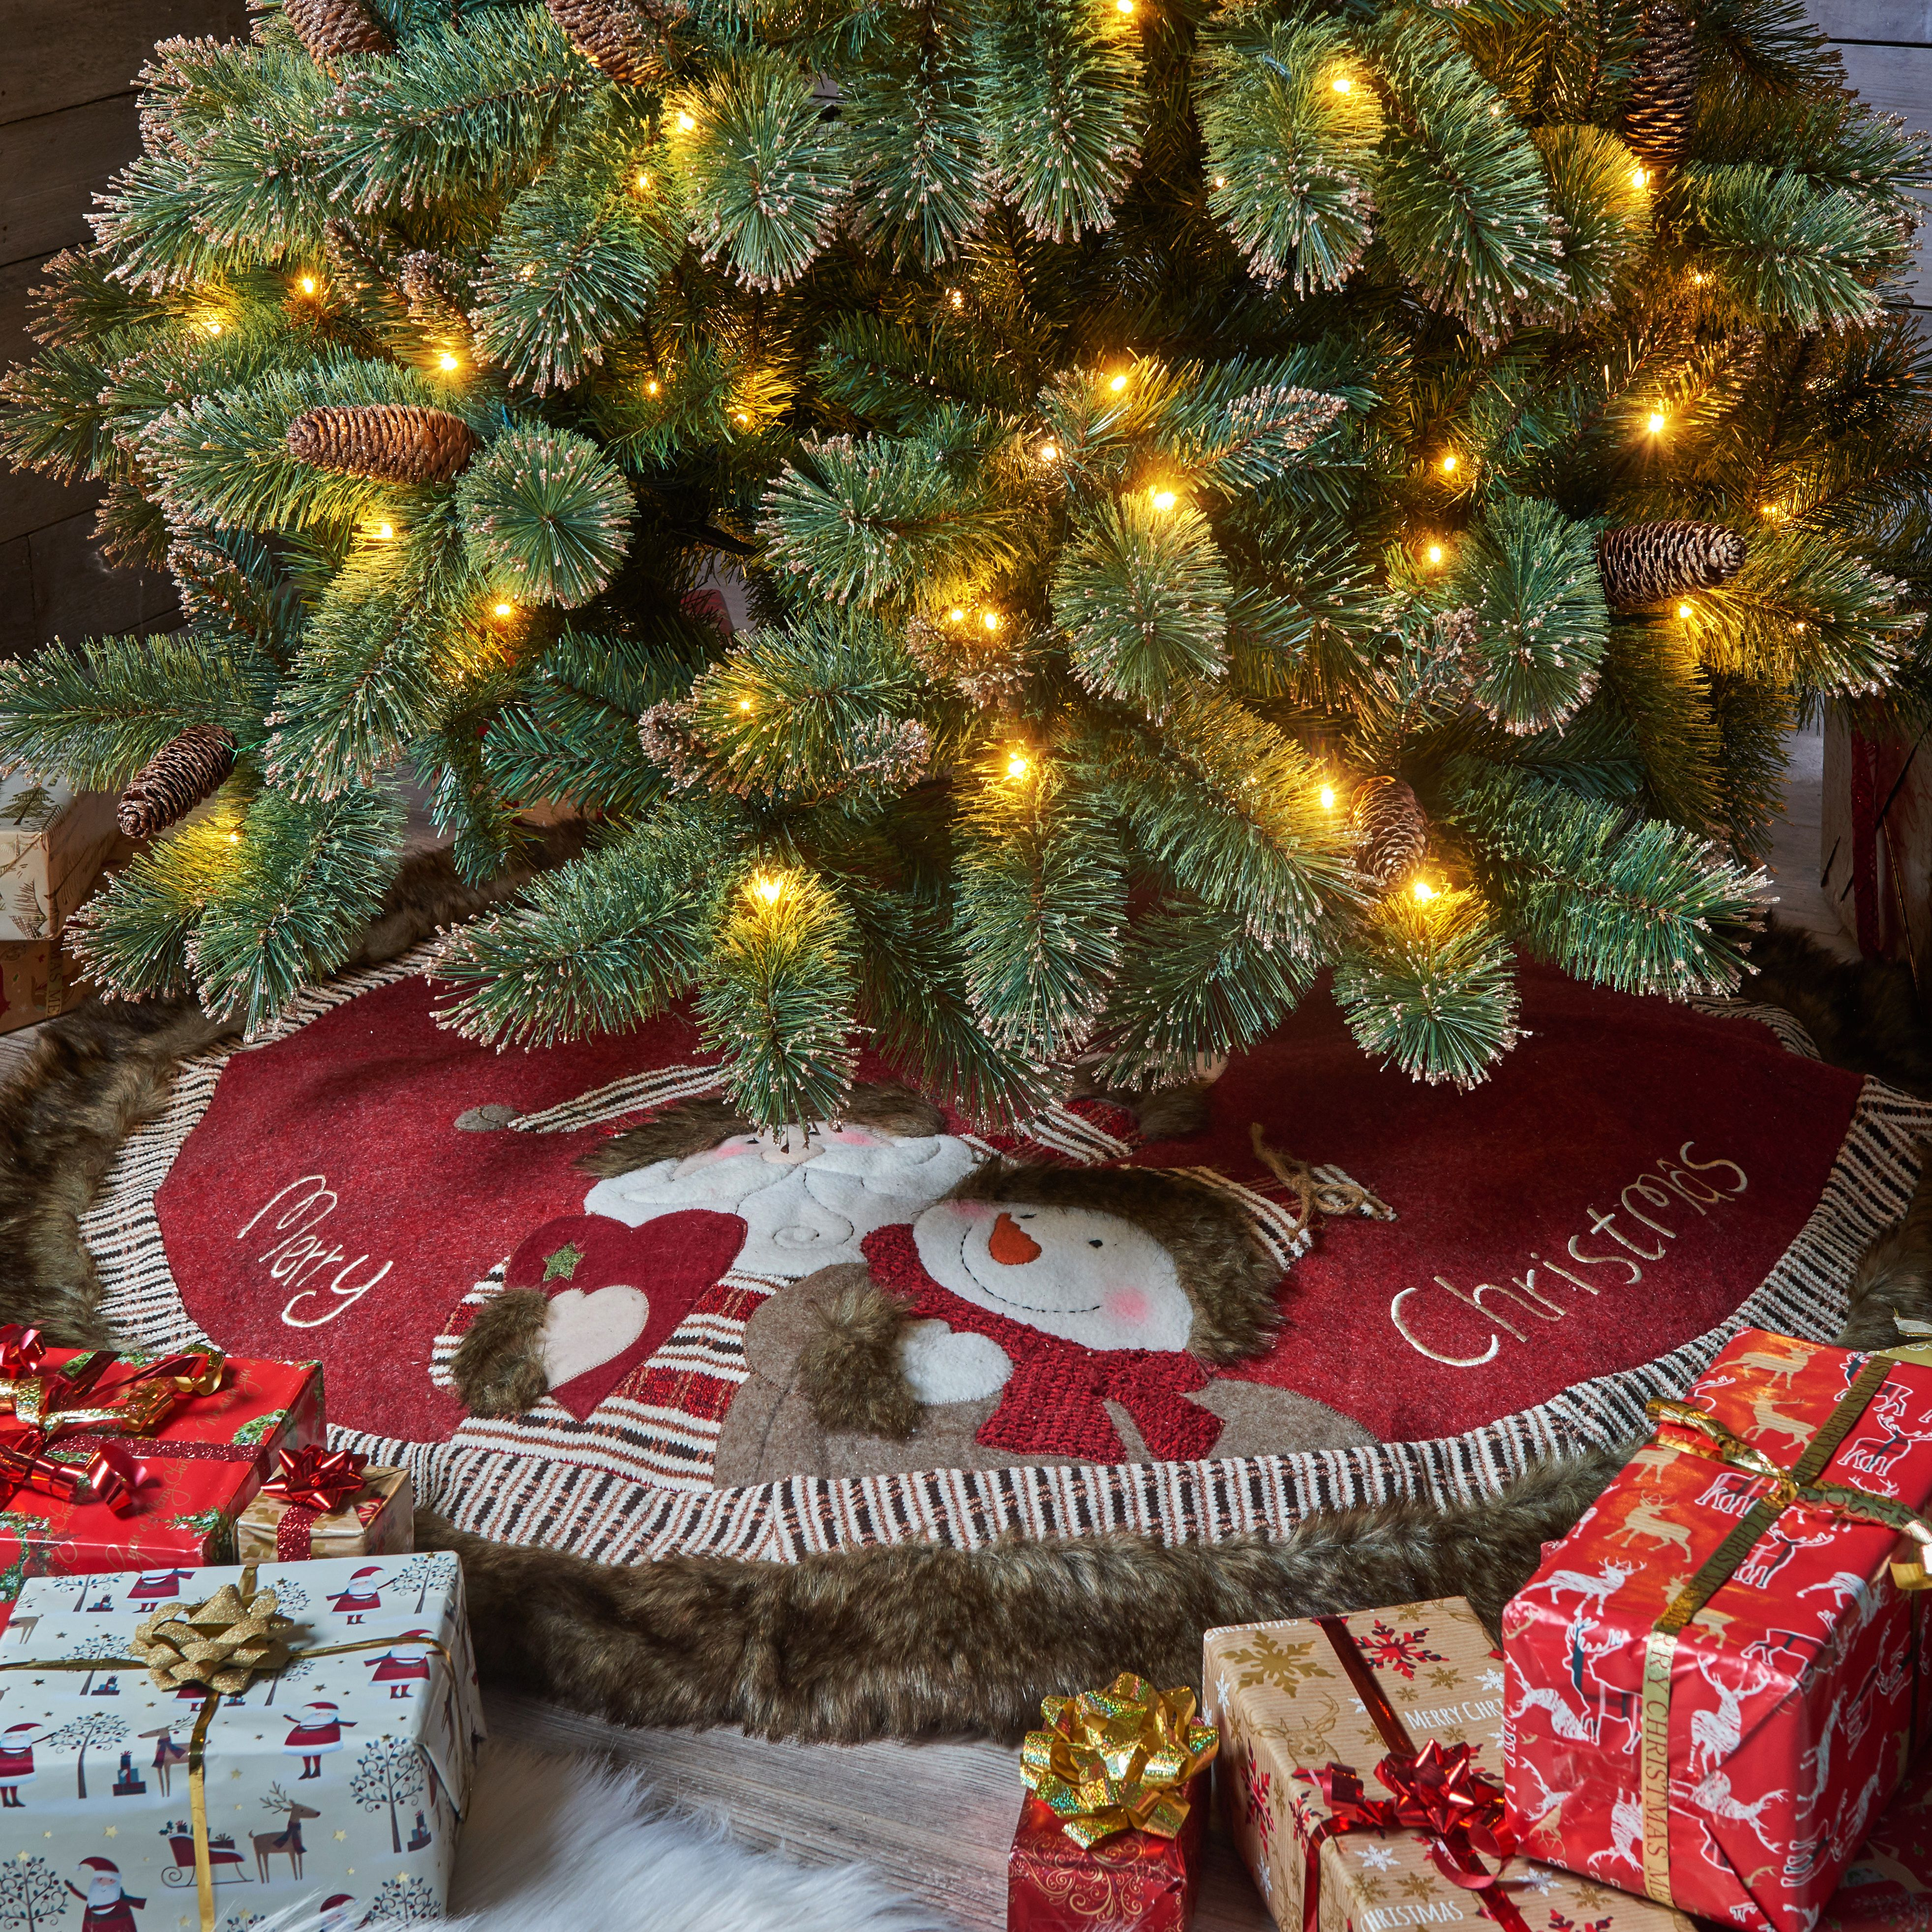 With a charming tartaned trim, the Merry Xmas Tartan Santa